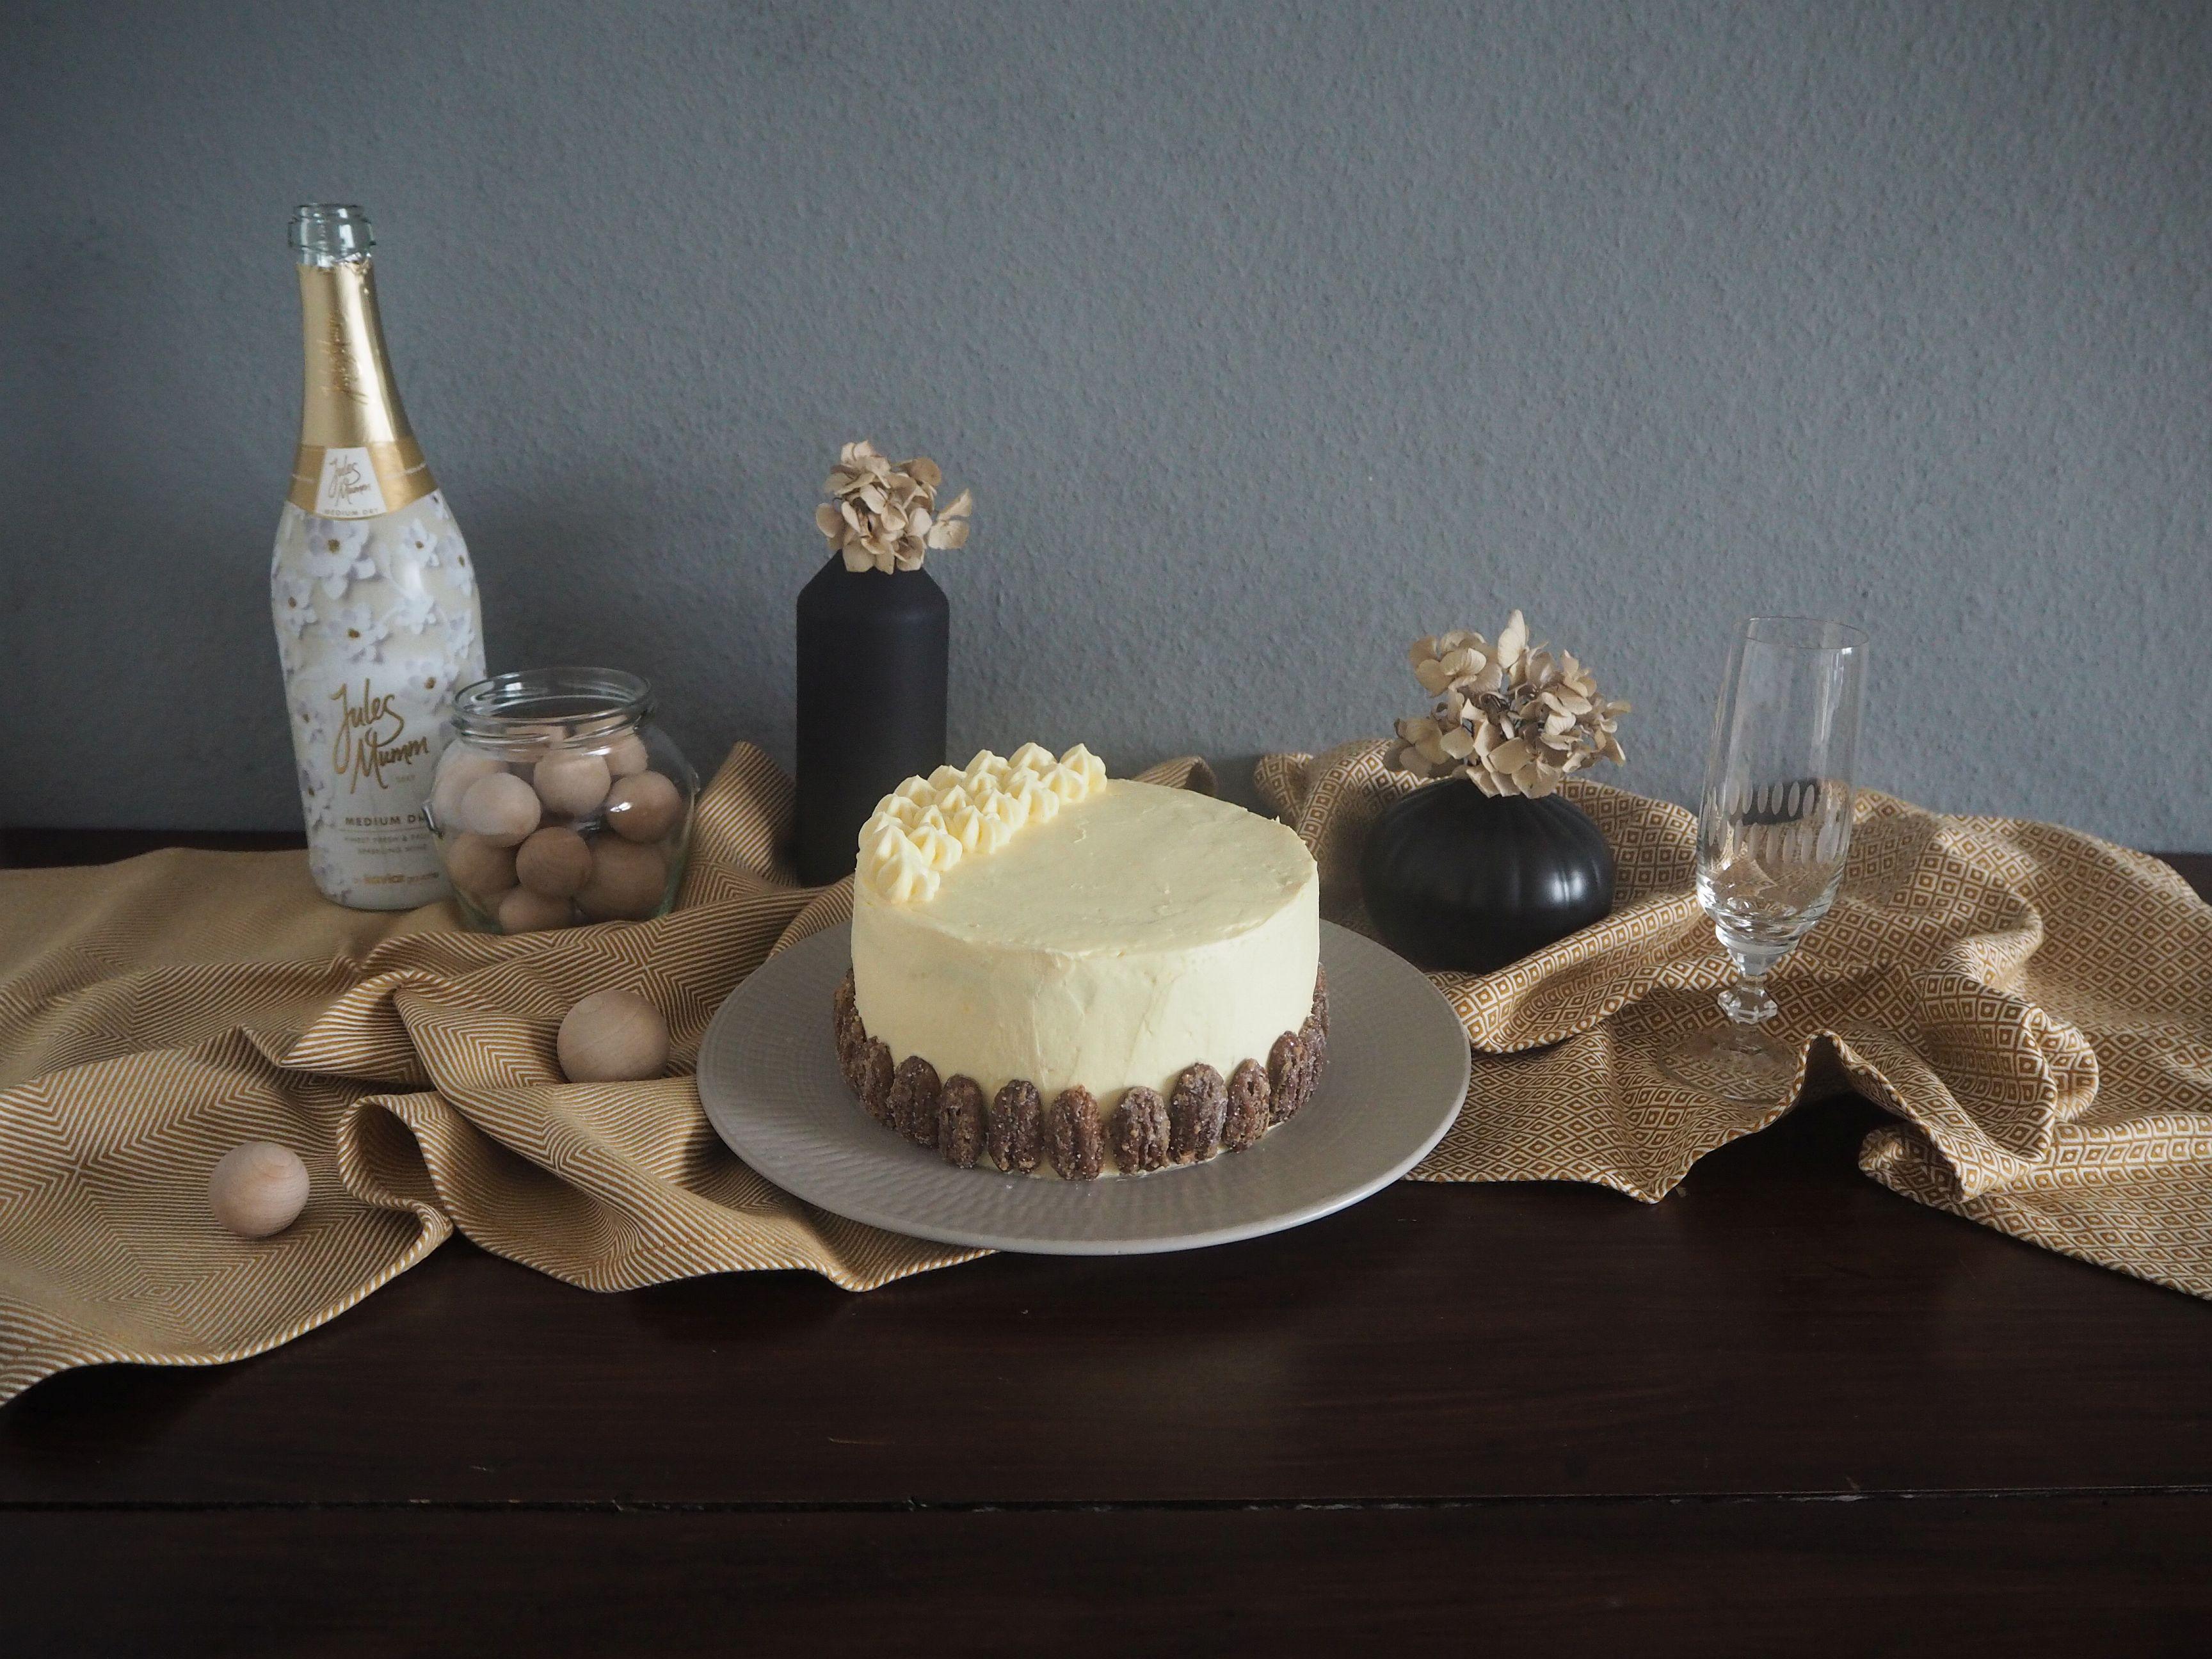 2017-12-skoen-och-kreativ-adventskalender-cookie-and-cake-love-birnen-pekannuss-cake (1)